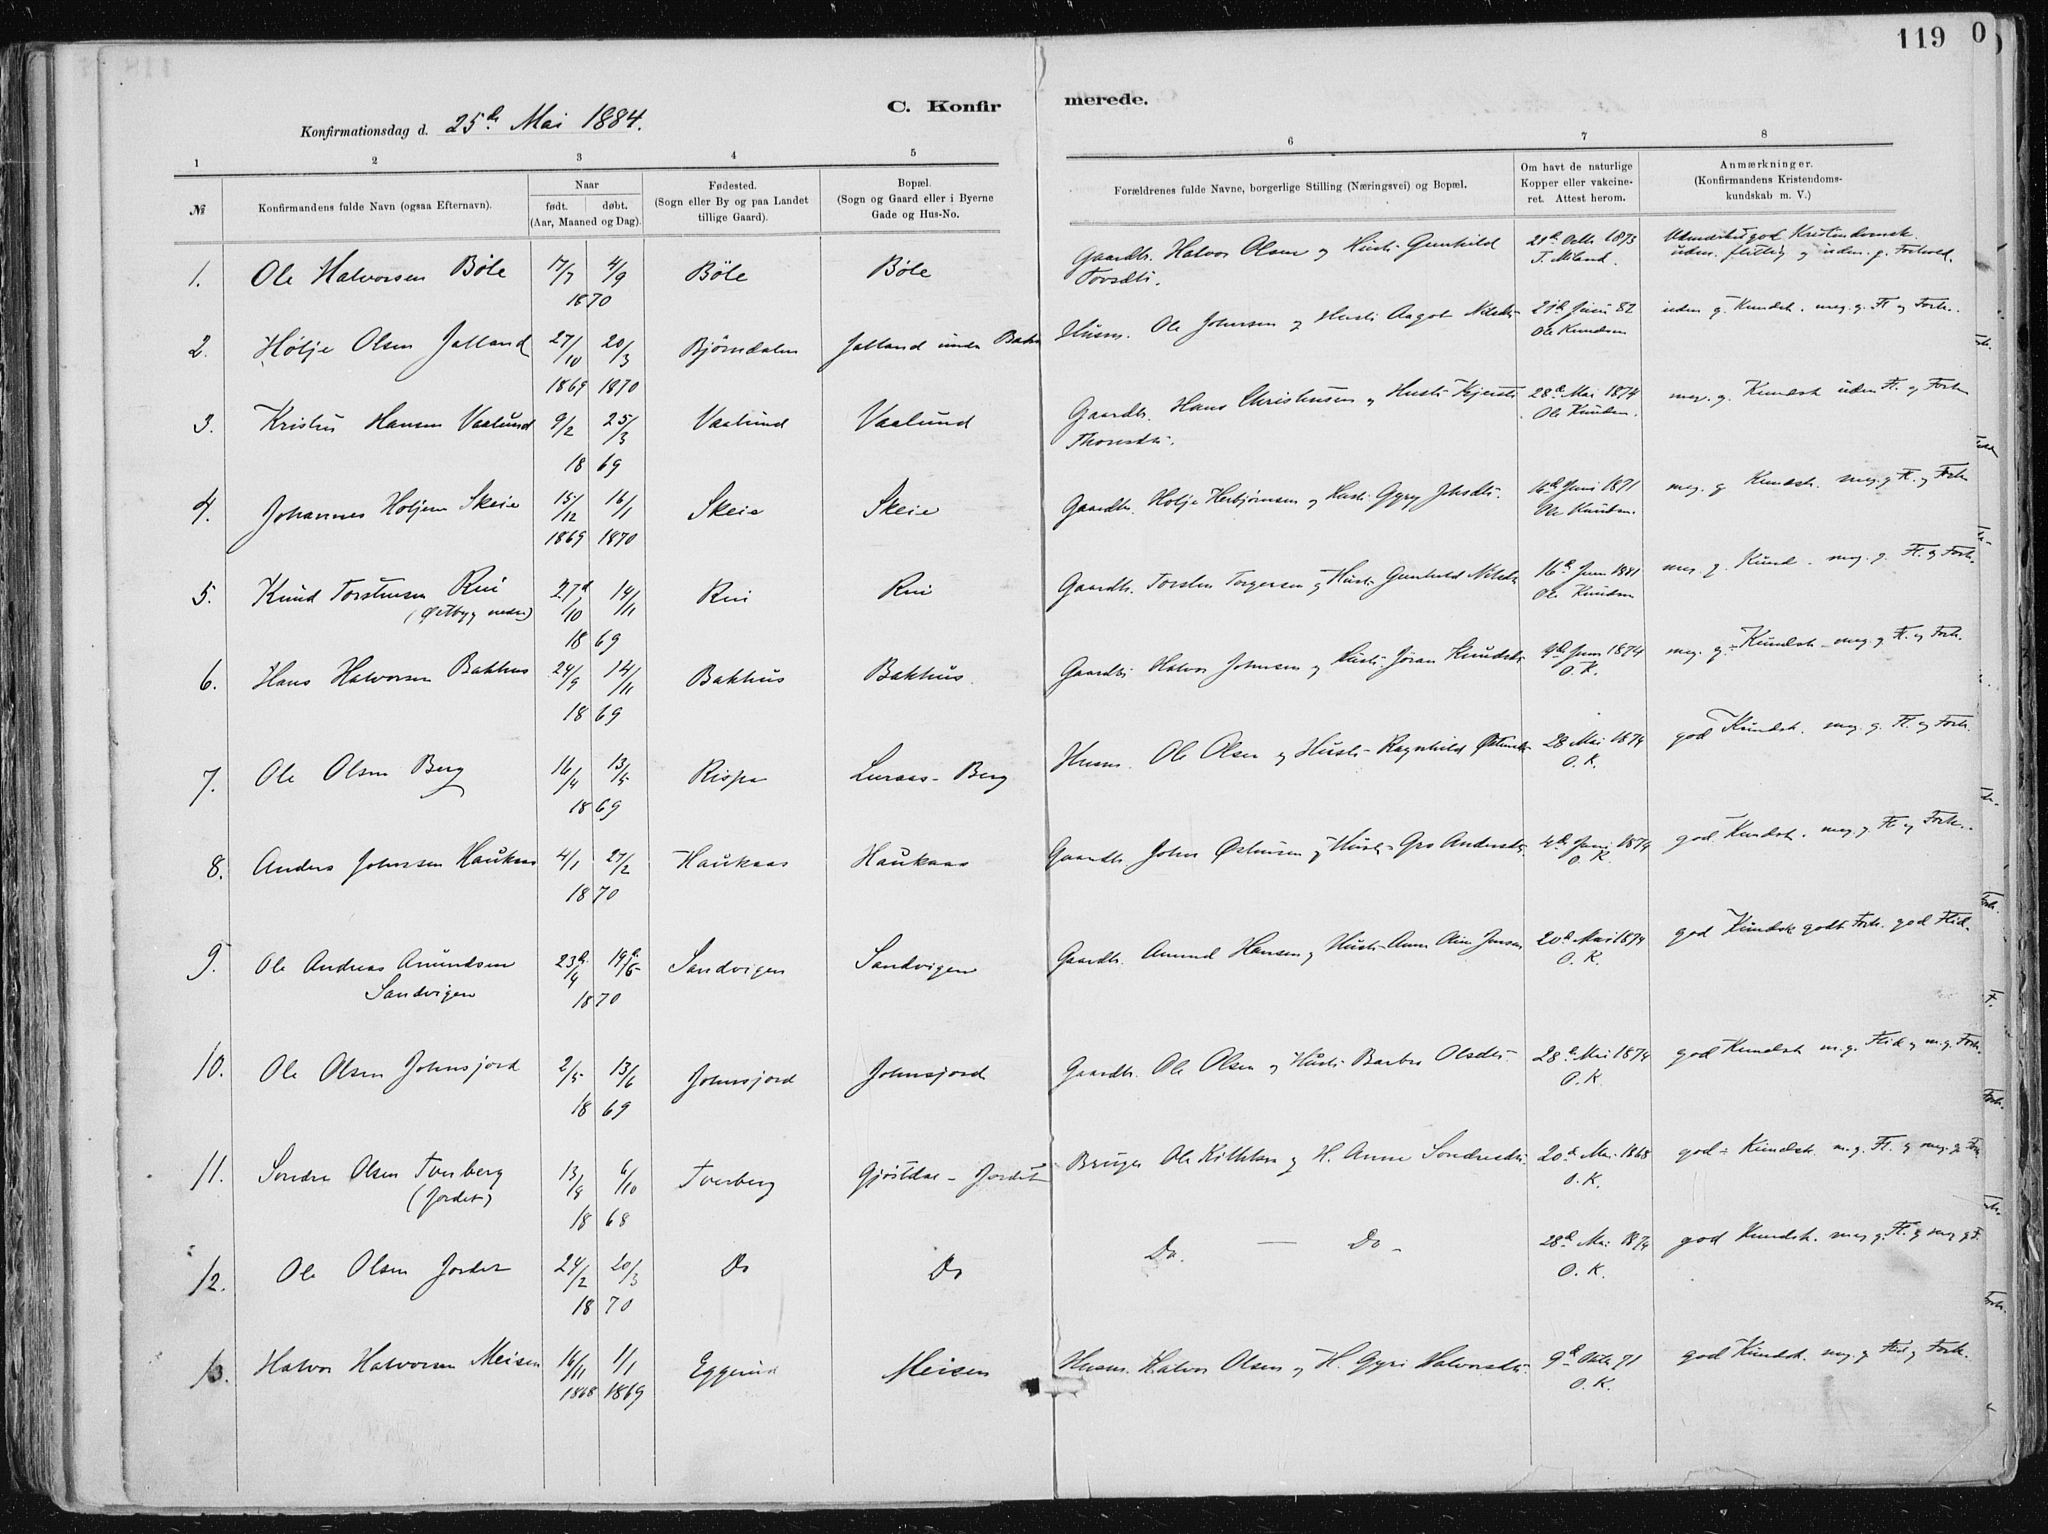 SAKO, Tinn kirkebøker, F/Fa/L0007: Ministerialbok nr. I 7, 1878-1922, s. 119